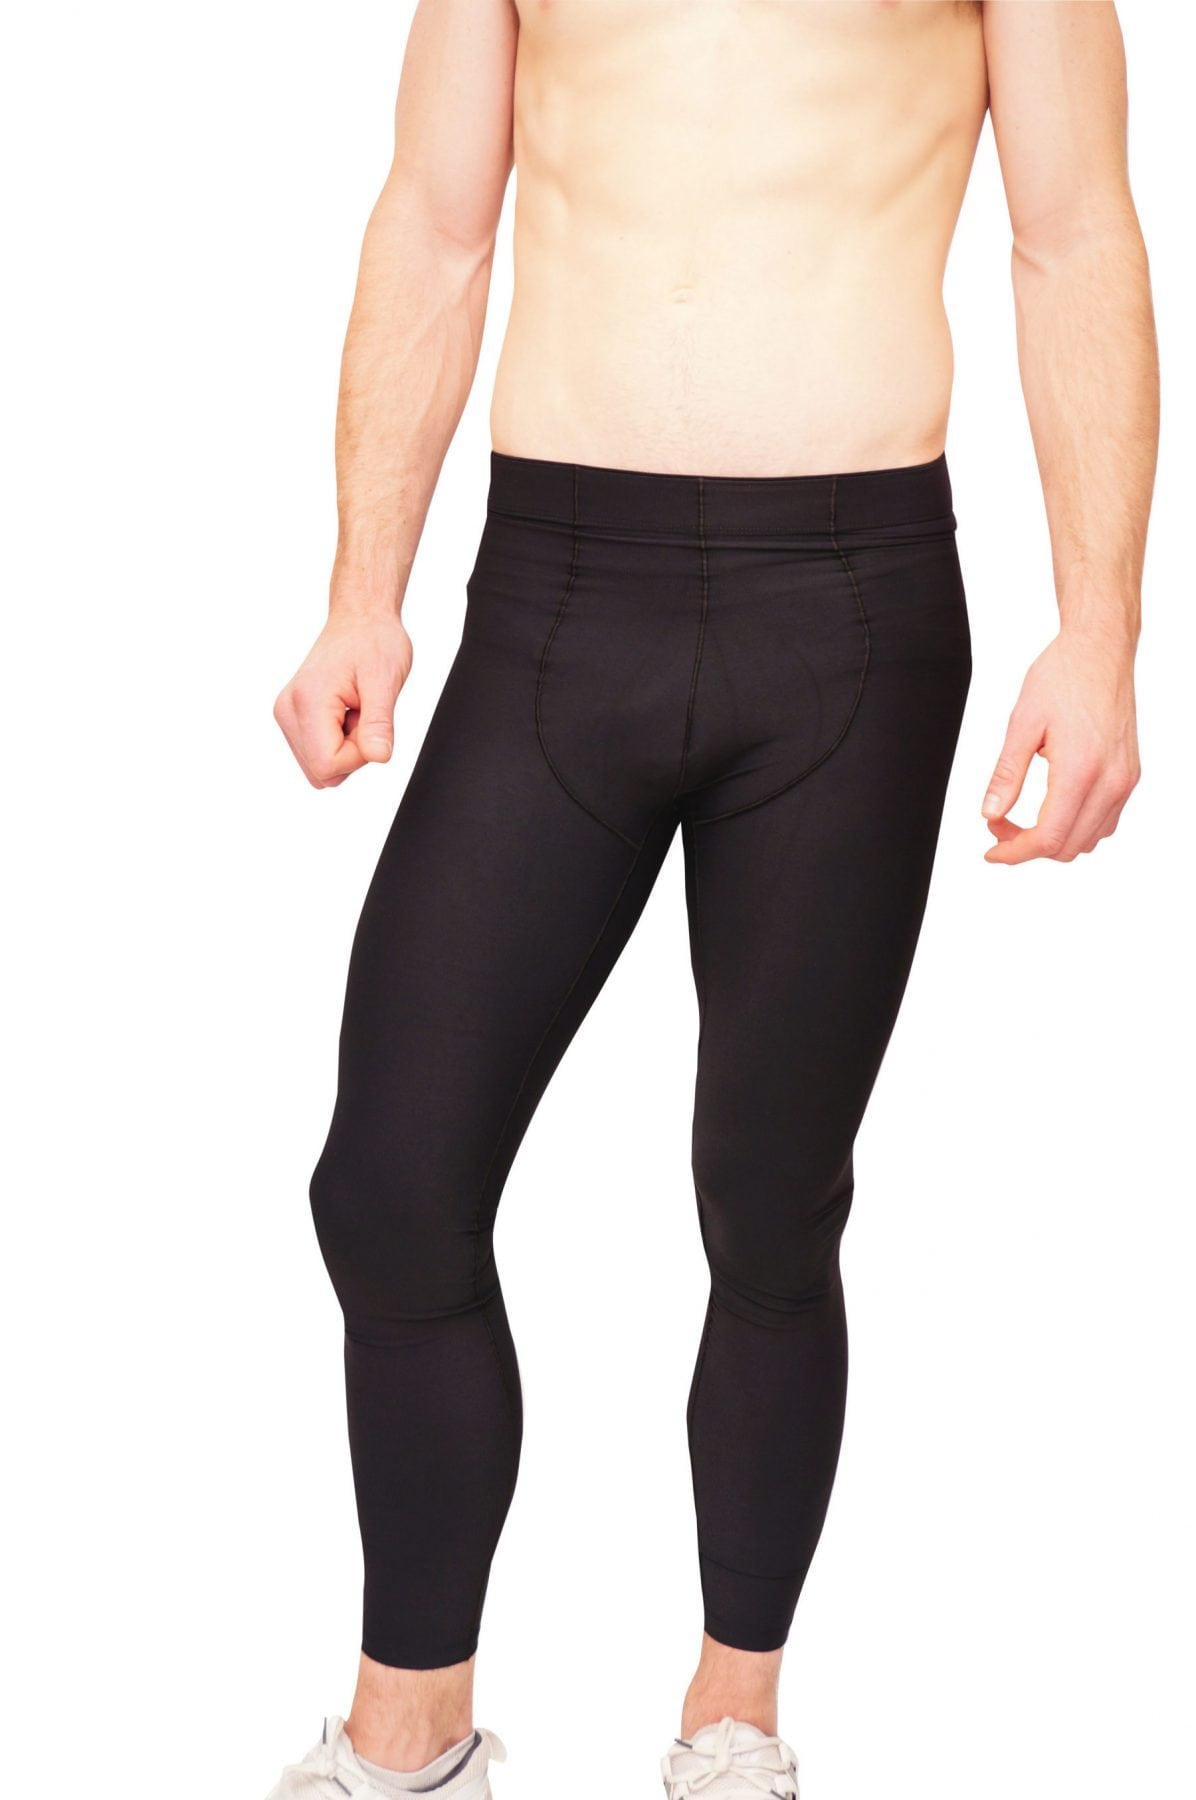 bb04944151 Marena Active Tights (601) - Australia s Compression Garment Specialists